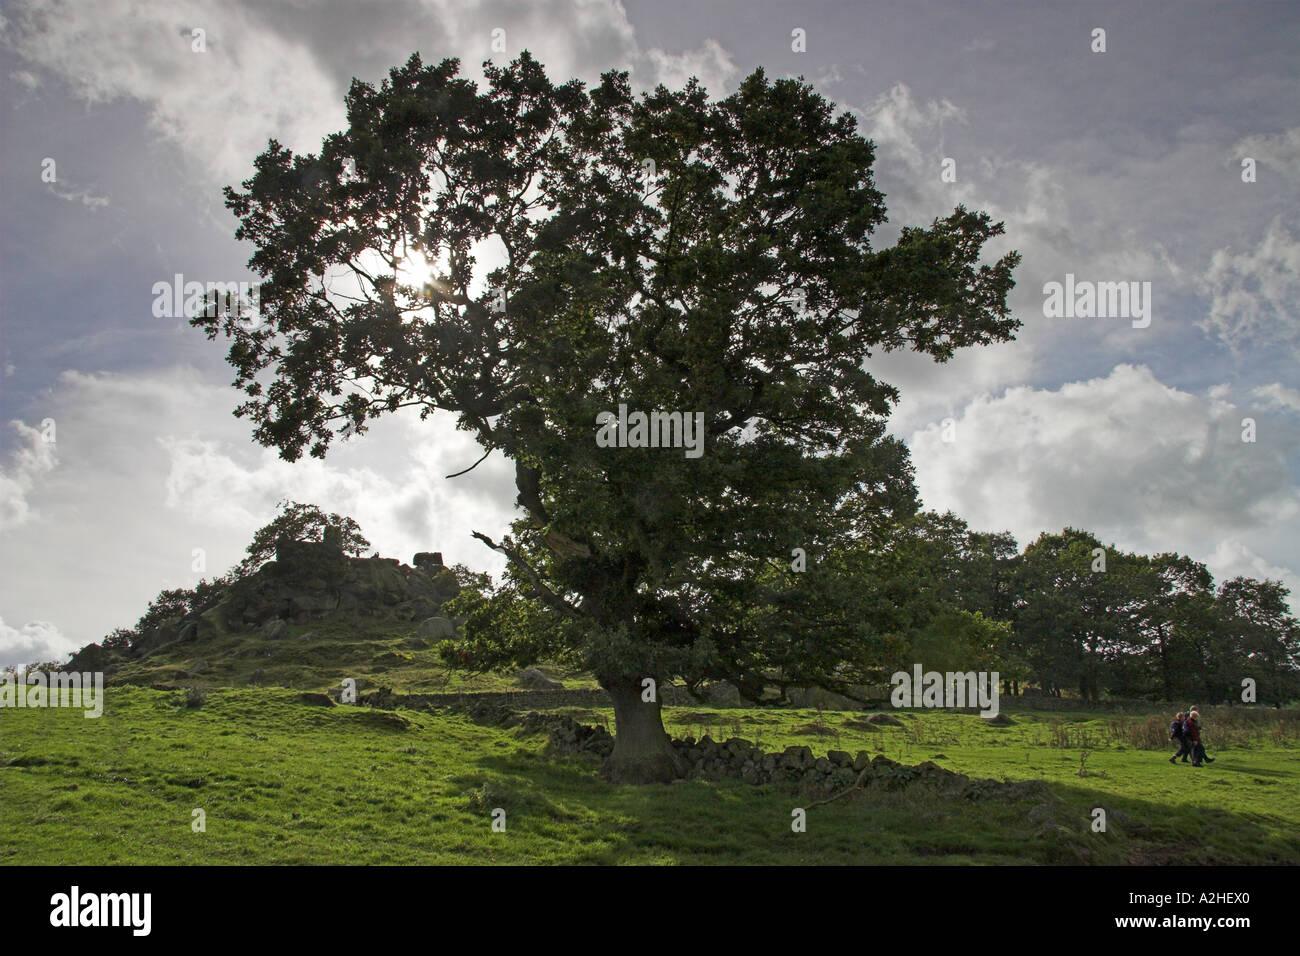 Robin Hood's Stride, Harthill Moor, Peak District National Park, Derbyshire, England - Stock Image